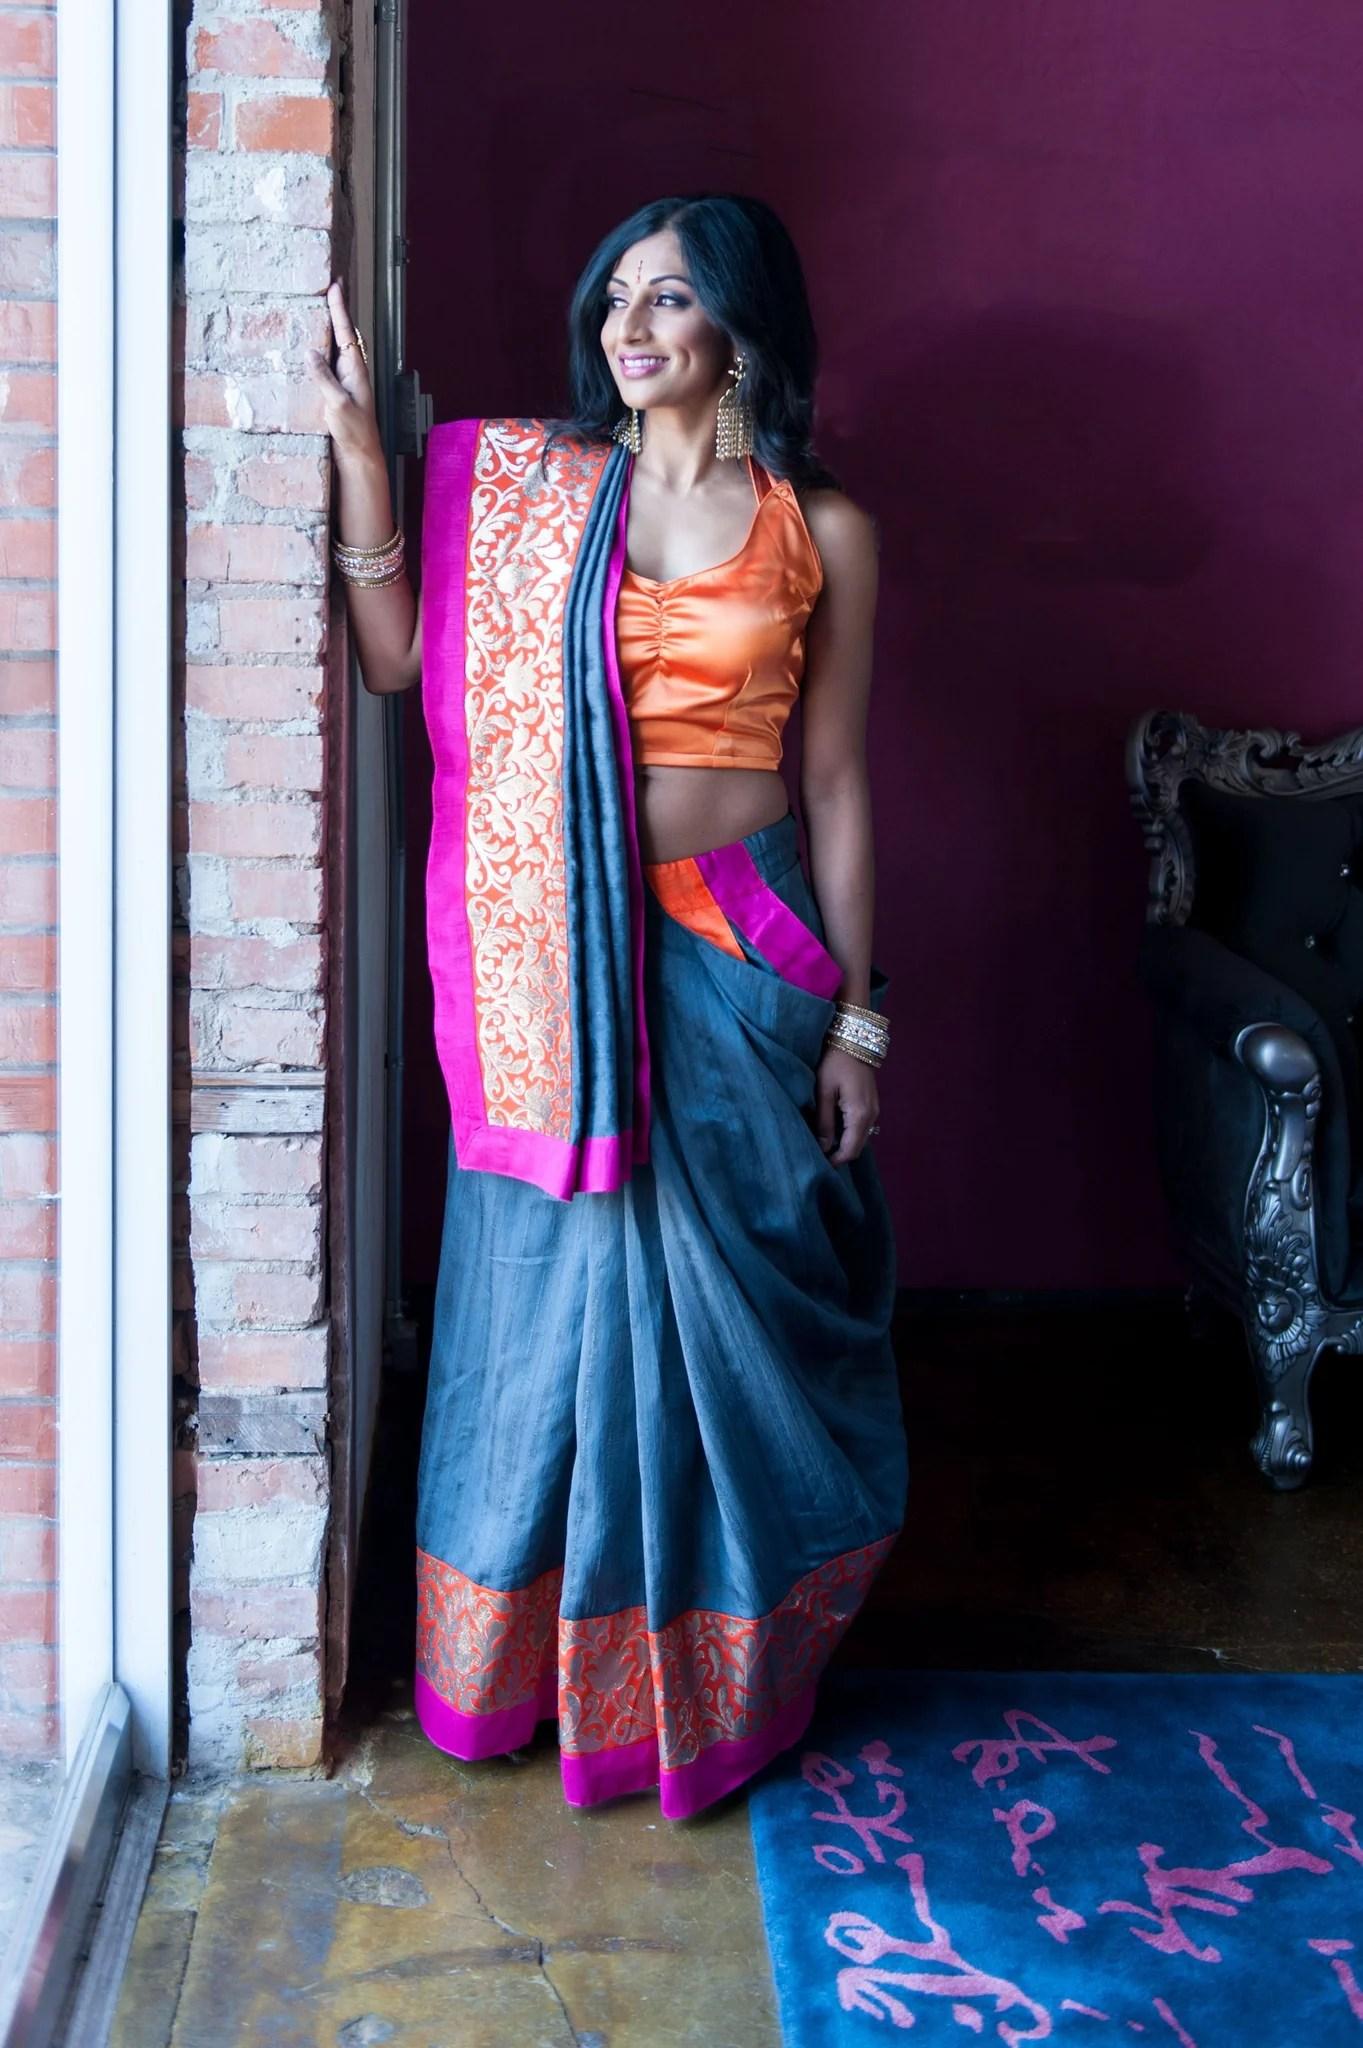 86daae6d2 Gujarati Clothing - Year of Clean Water